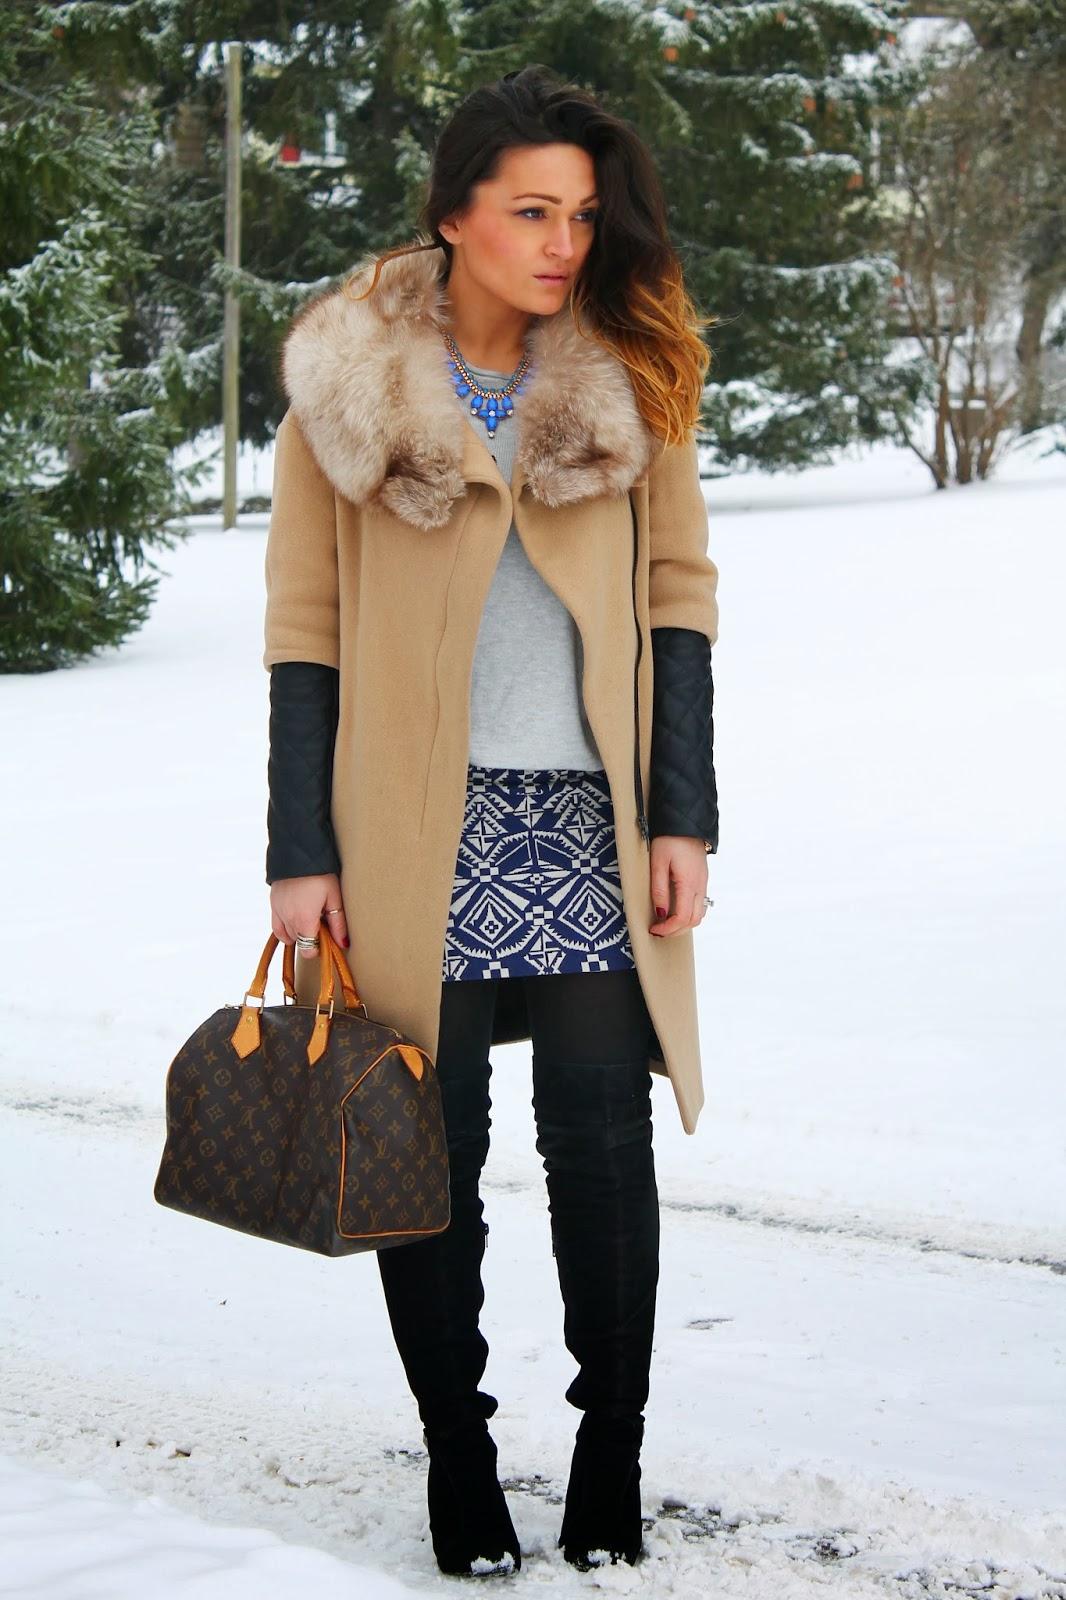 #aldo #aldoboots #overthekneeboots #boots #suedeboots #overtheknee #leather #party #holiday #fashion #streetstyle #toronto #canada #fashionblogger #canadianfashionblogger #serbianfashionblogger #outfit #ootd #trend #hotblogger #bestblogger #topblogger #topfashionblogger #fur #leather #torontostreetstyle #torontofashion #torontoblogger #topcanadianblogger #canadianfashion #srpksablogerka #srpskeblogerke #moda #stil #srkpskamoda #topblogger #bestblogger #bestcanadianblogger #ukblogger #ukbloggers #bestukbloggers #hm #h&M #sweater #hmsweater #h&msweater #zara #zarajacket #beanie #beanieoutfit #printjacket #danierleather #louisvuitton #louisvuittonspeedy #speedy #monogramspeedy #leatherbag #leathersatchel #philiplim #ottawa #Ontario #ontarioblogger #urbanbehavior #urbanplanet #bestofstreetstyle #beststreetstyle #furcoat #stripes #stripedsweather #layering #layeringclothes #joefresh #canadiandesigner #aztec #aztecprint #aztecprintskirt #forever21 #forever21skirt #fur #popofcolour #brightoutfit #cobaltblue #cobaltbluenecklace #royalblue #royalbluenecklace #statementnecklace #furcollar #furcollarcoat #chicisimo #chictopia #sashadollfashioncloset #sashadollfashion #sashadoll #ootd #outfitoftheday